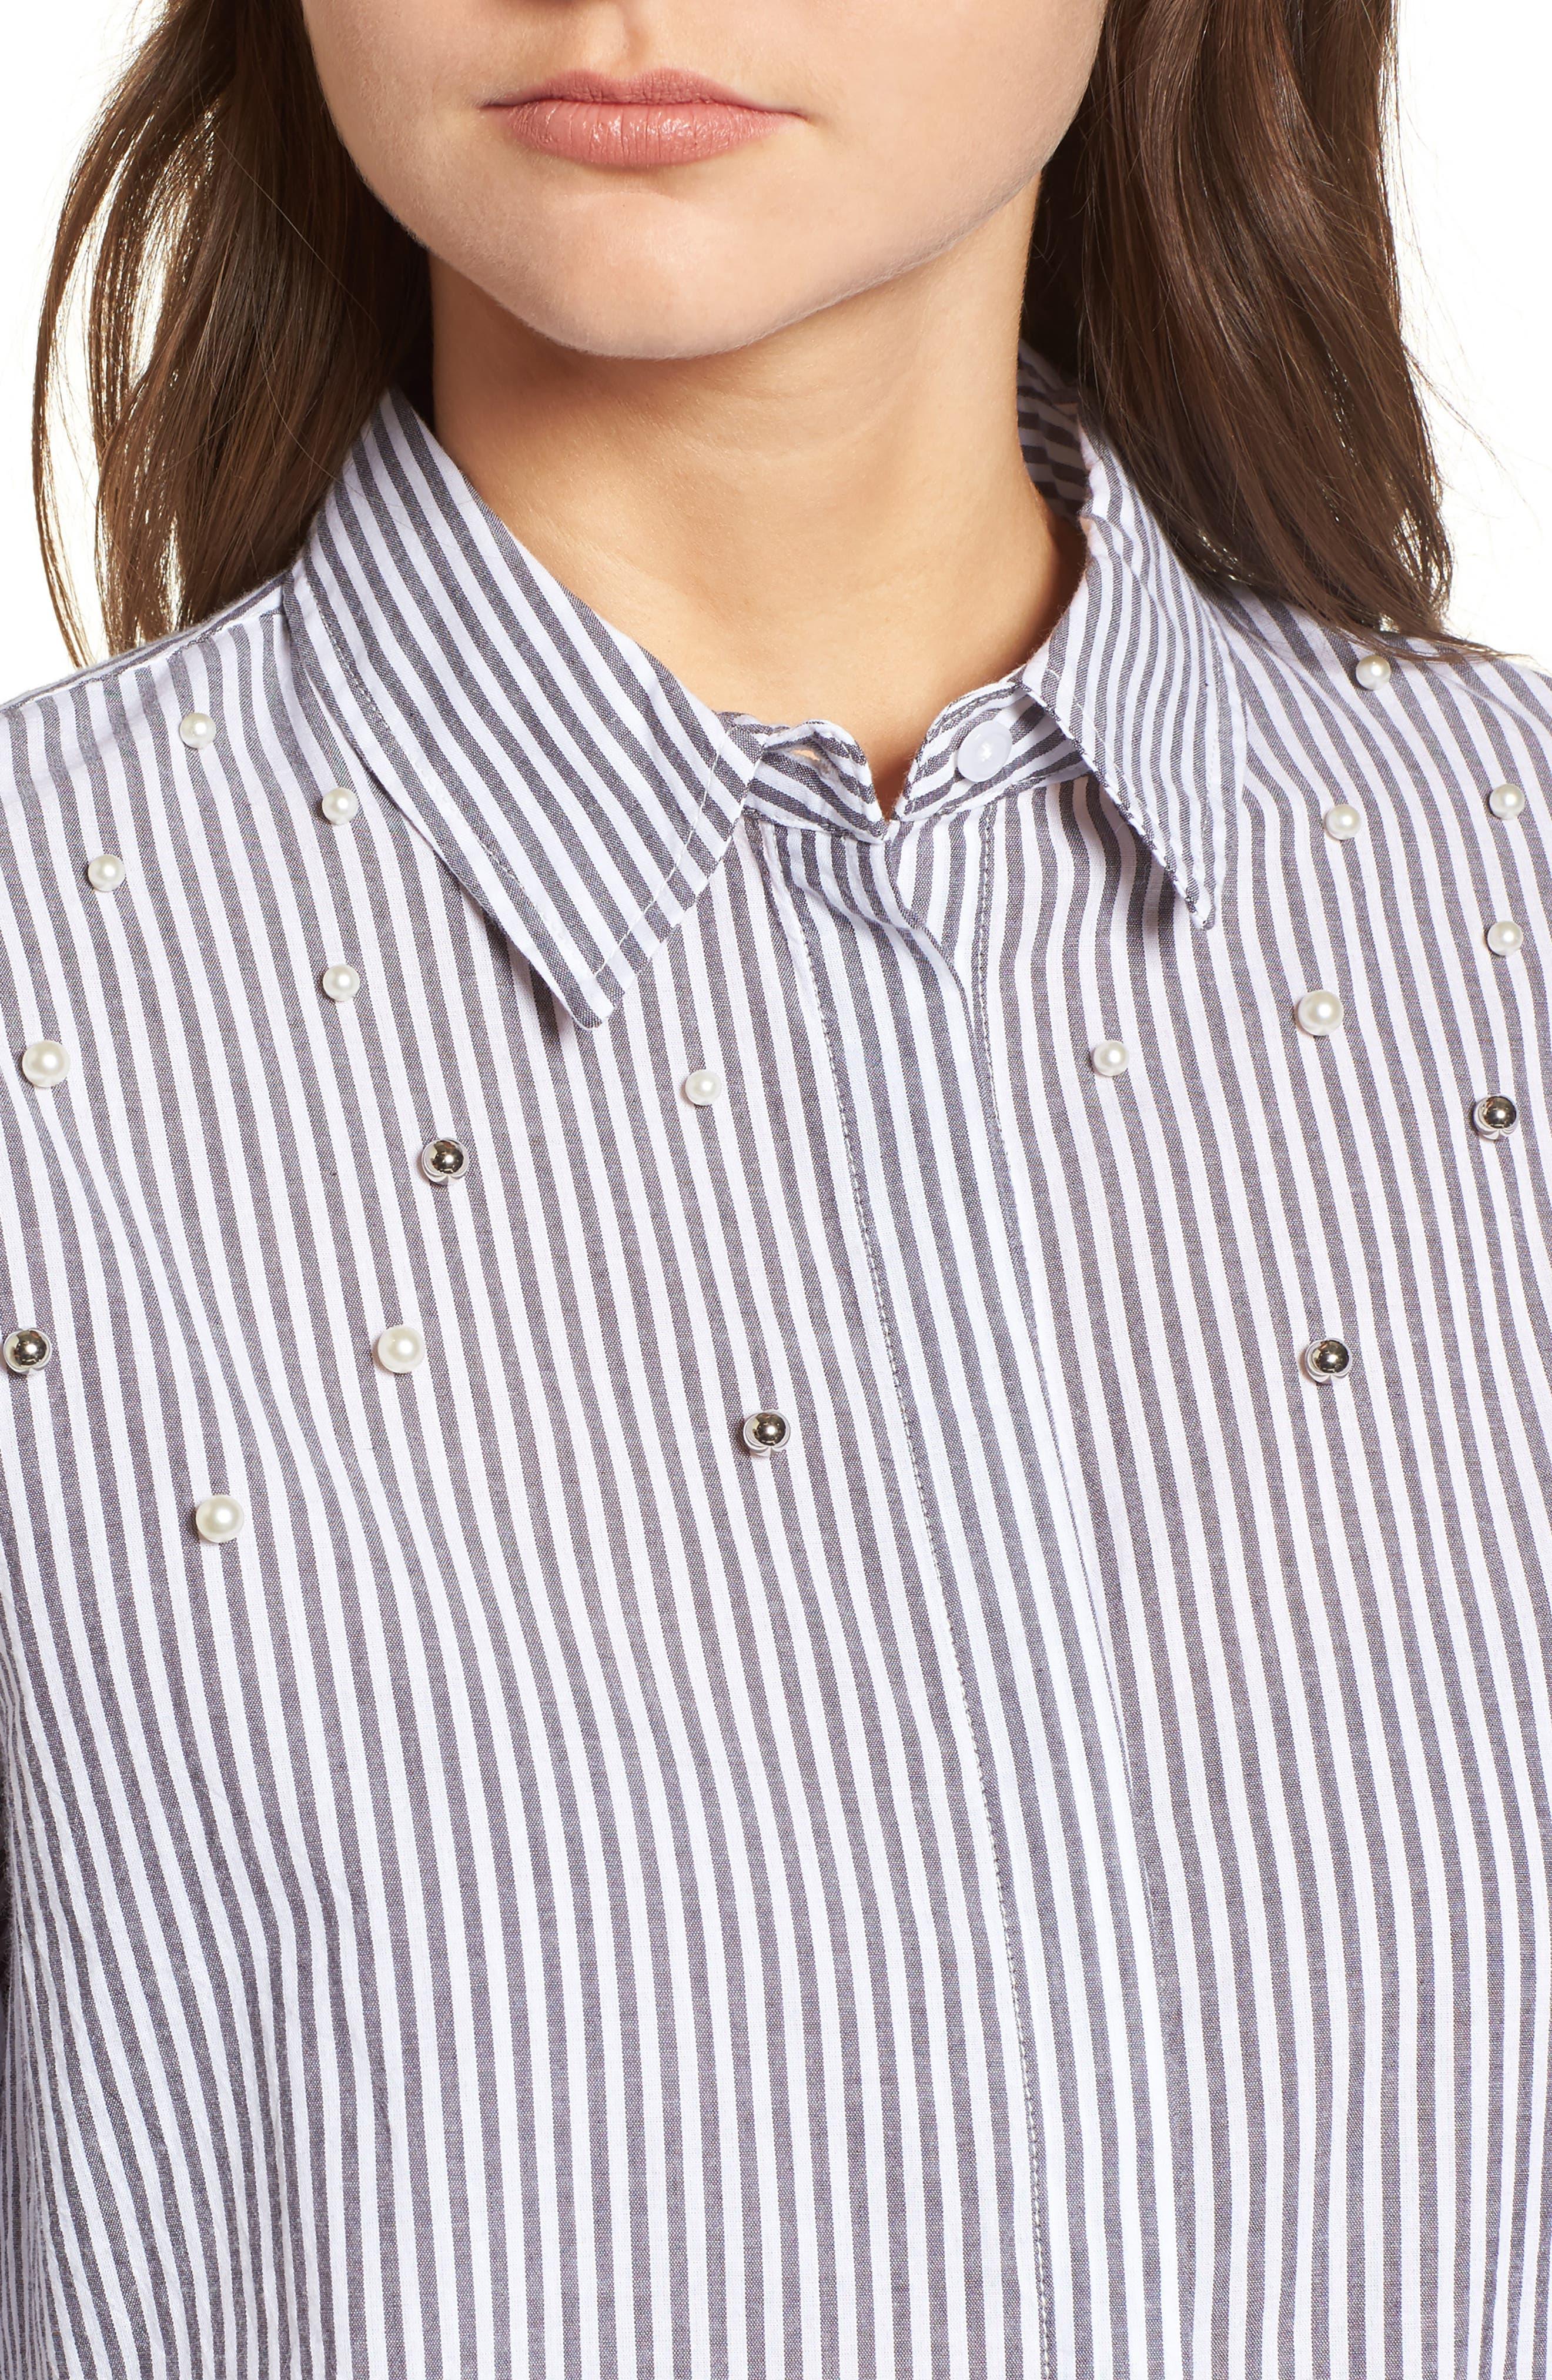 Taylor Embellished Shirt,                             Alternate thumbnail 4, color,                             Florence Stripe Studded Pearls